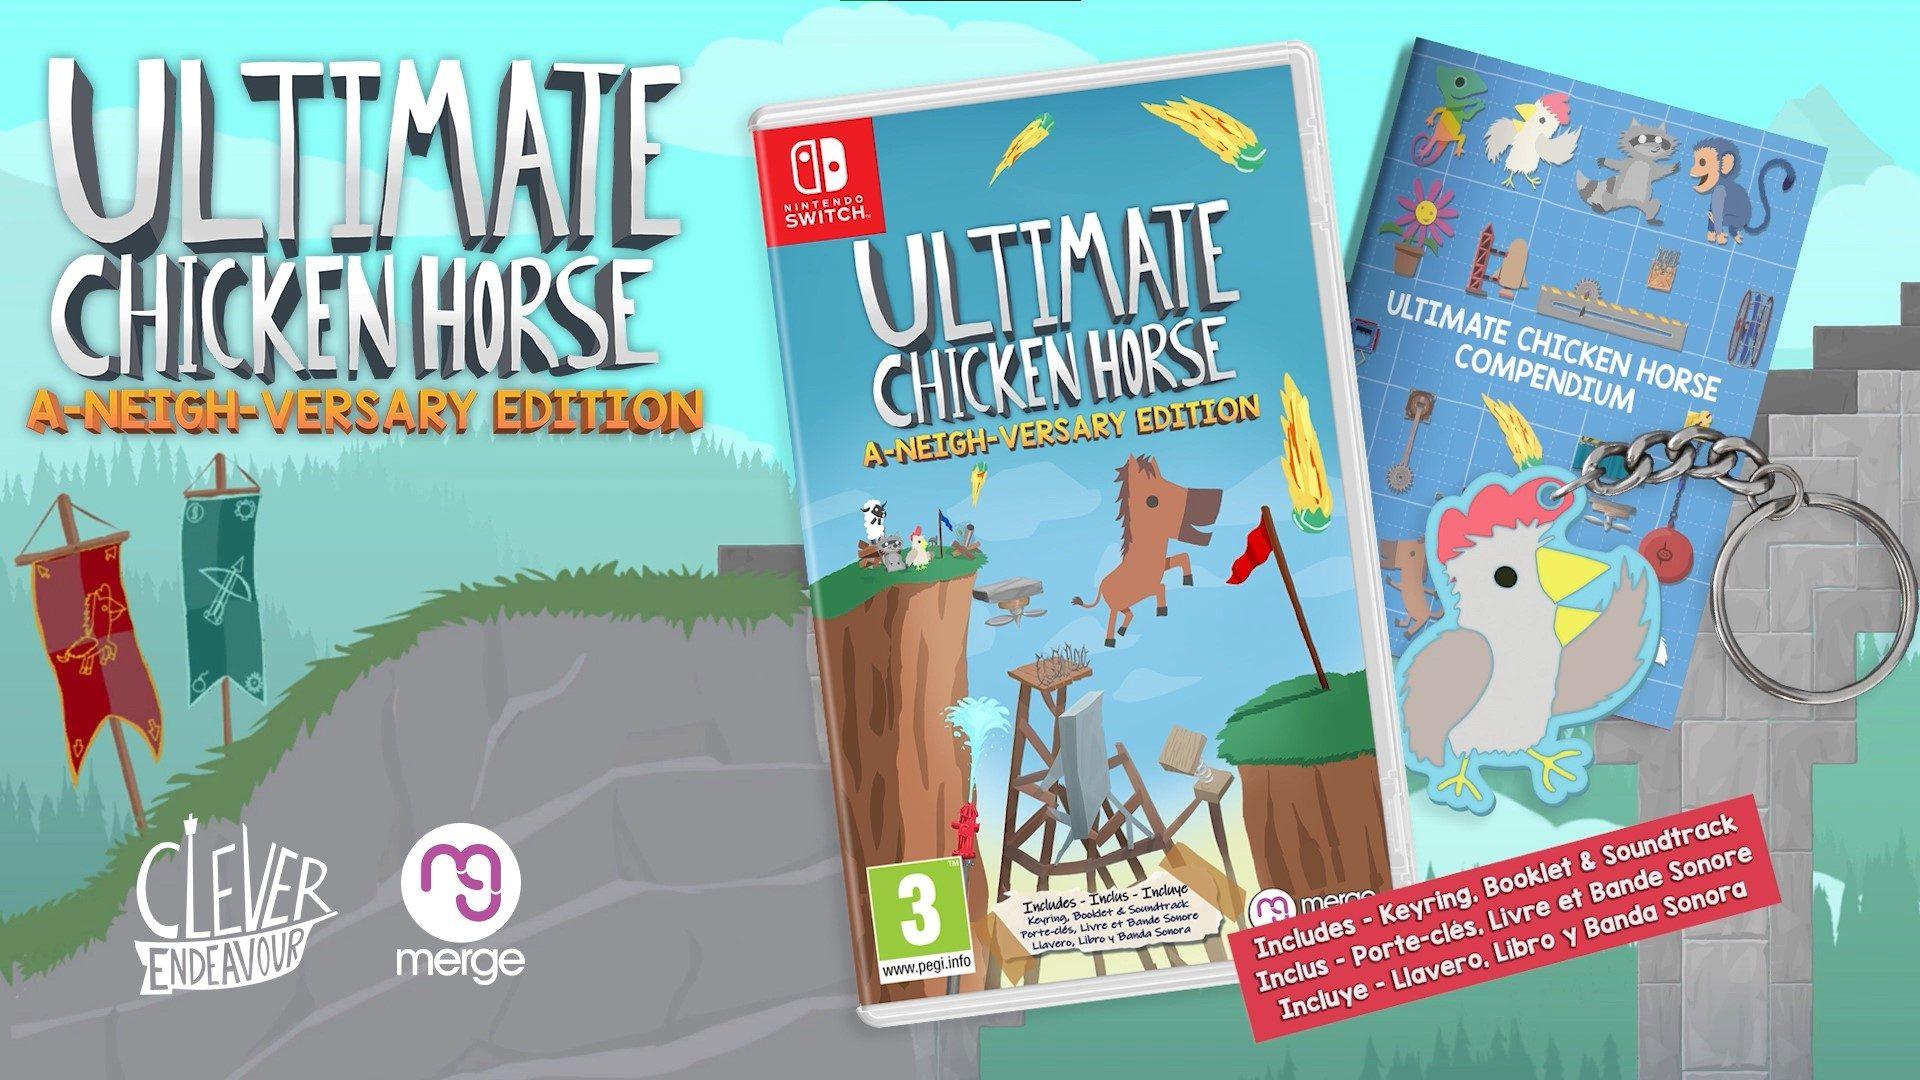 ultimate chicken horse packshot